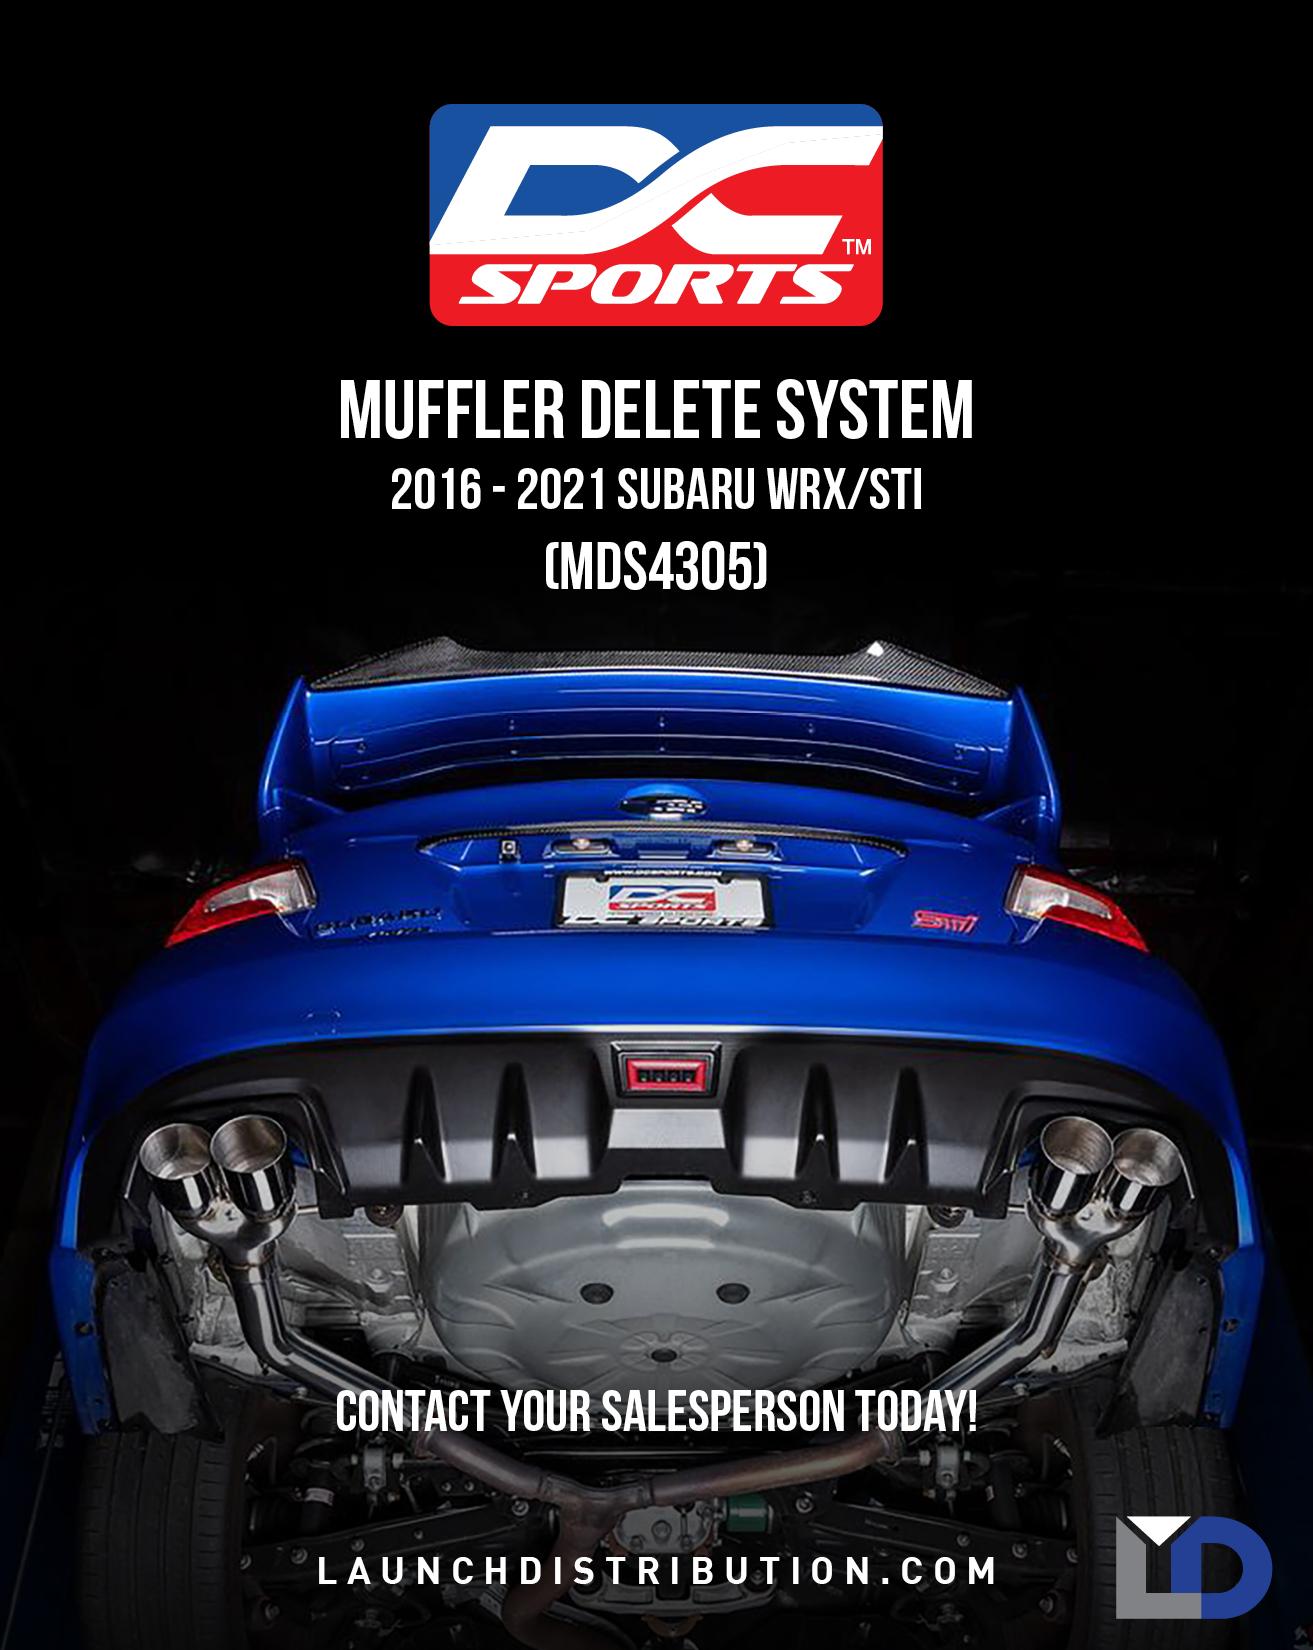 DC Sports Muffler Delete System 16+ Subaru WRX/STi